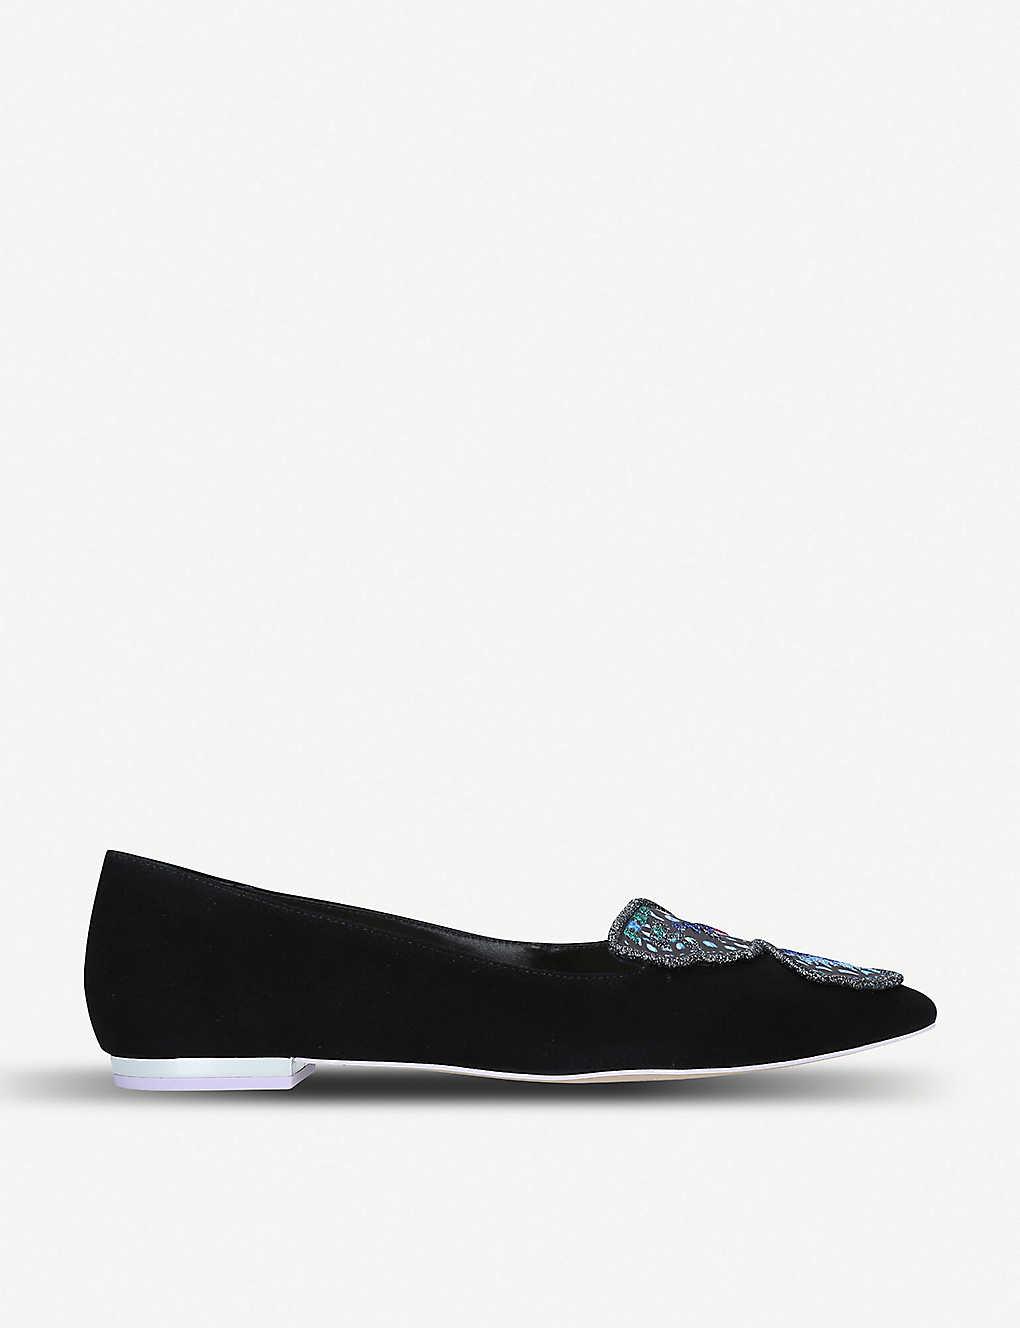 214161b59d99 SOPHIA WEBSTER - Bibi Butterfly embellished suede pointed-toe flats ...